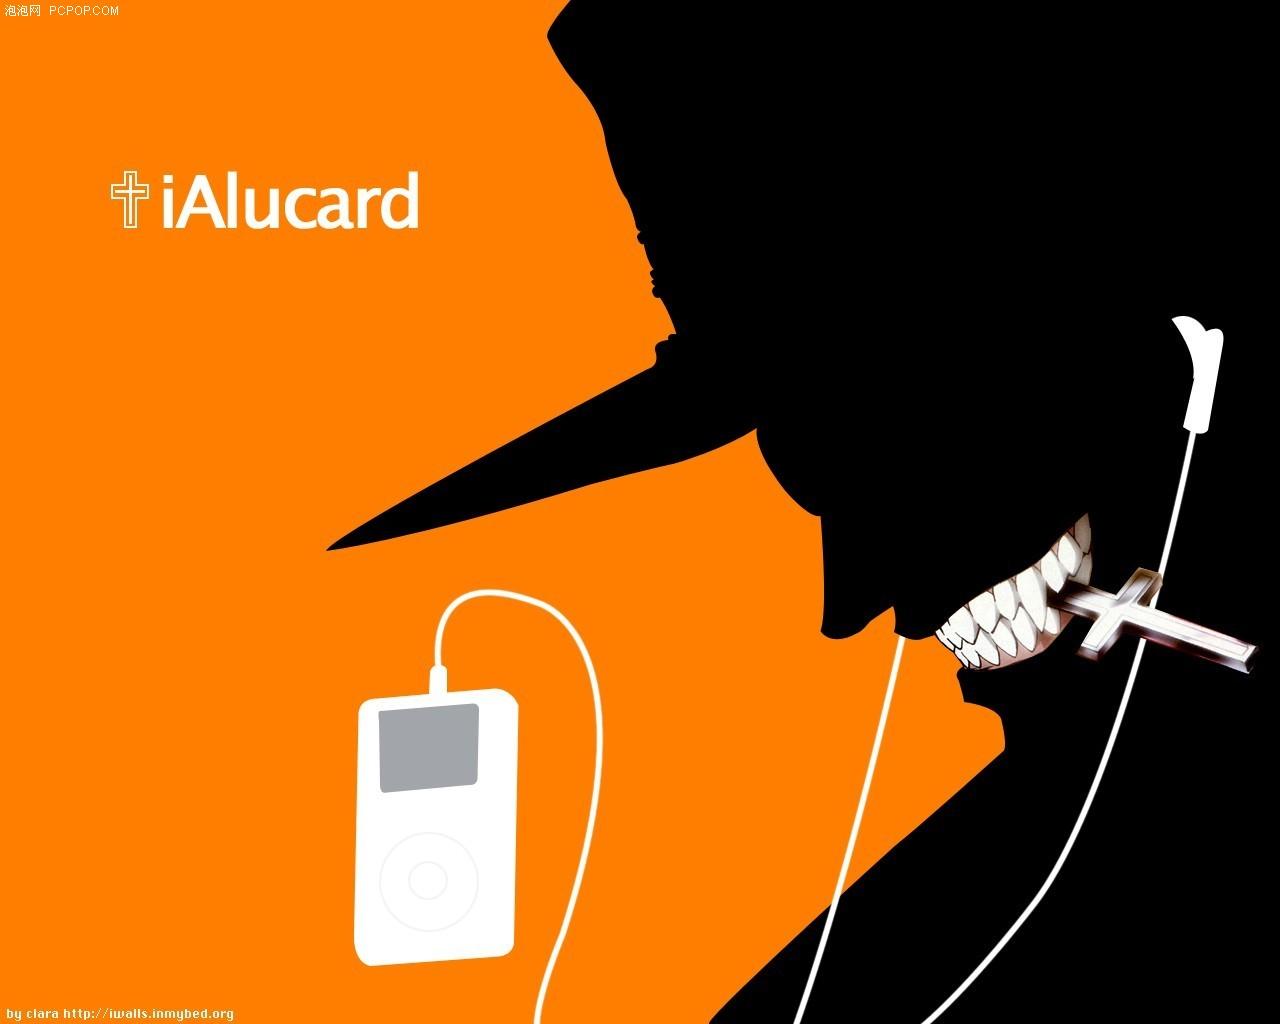 ipad高清壁纸 iphone ipad 壁纸区 - 苹果i派党论坛